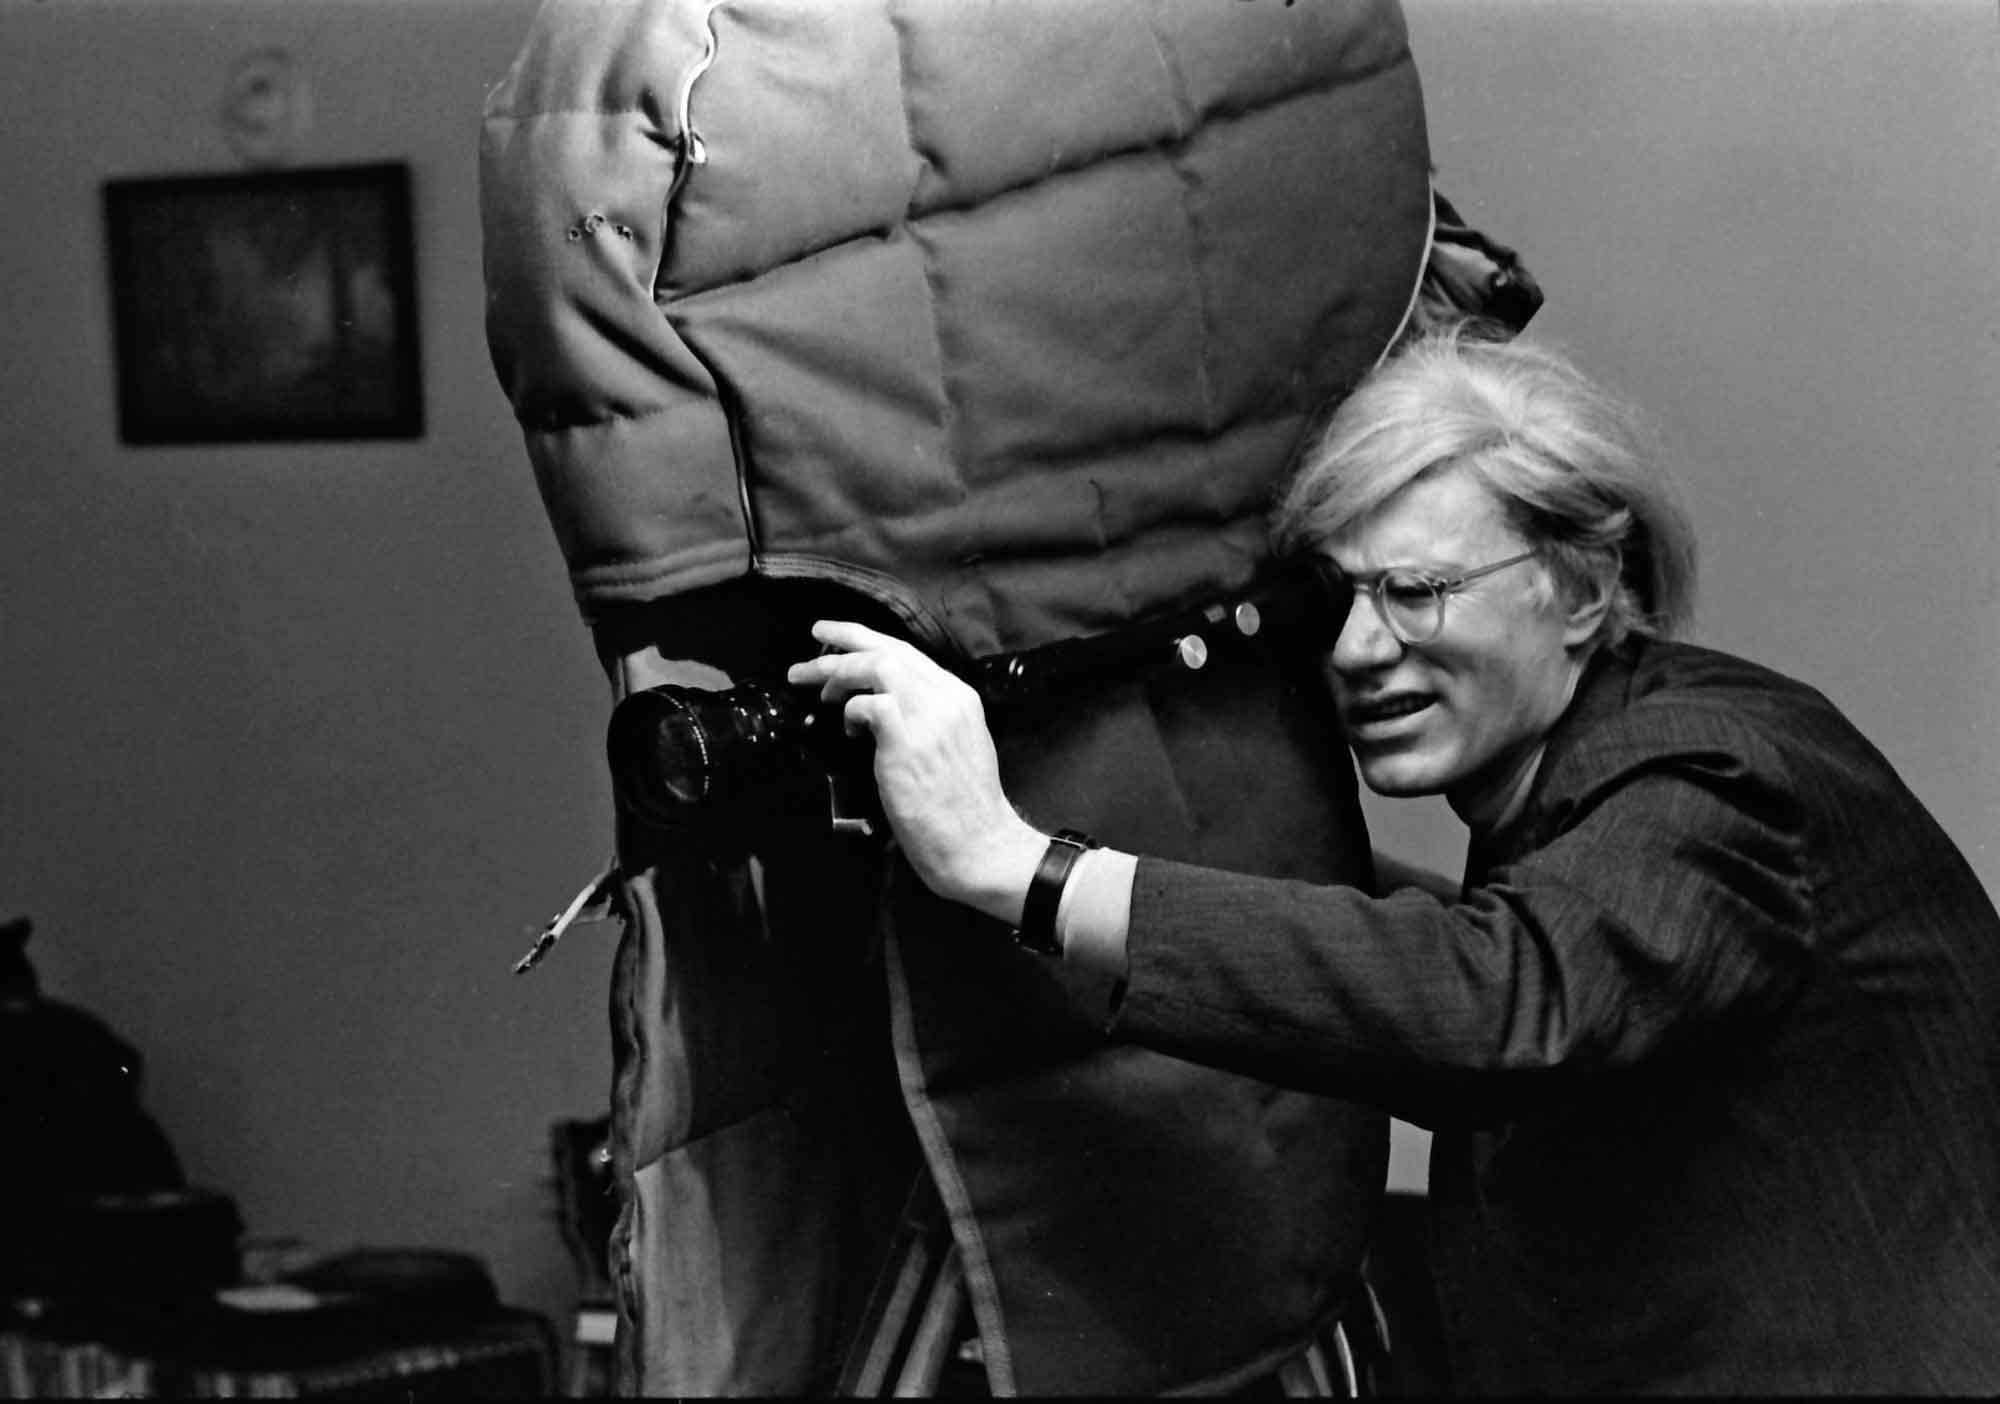 Andy Warhol operating a camera